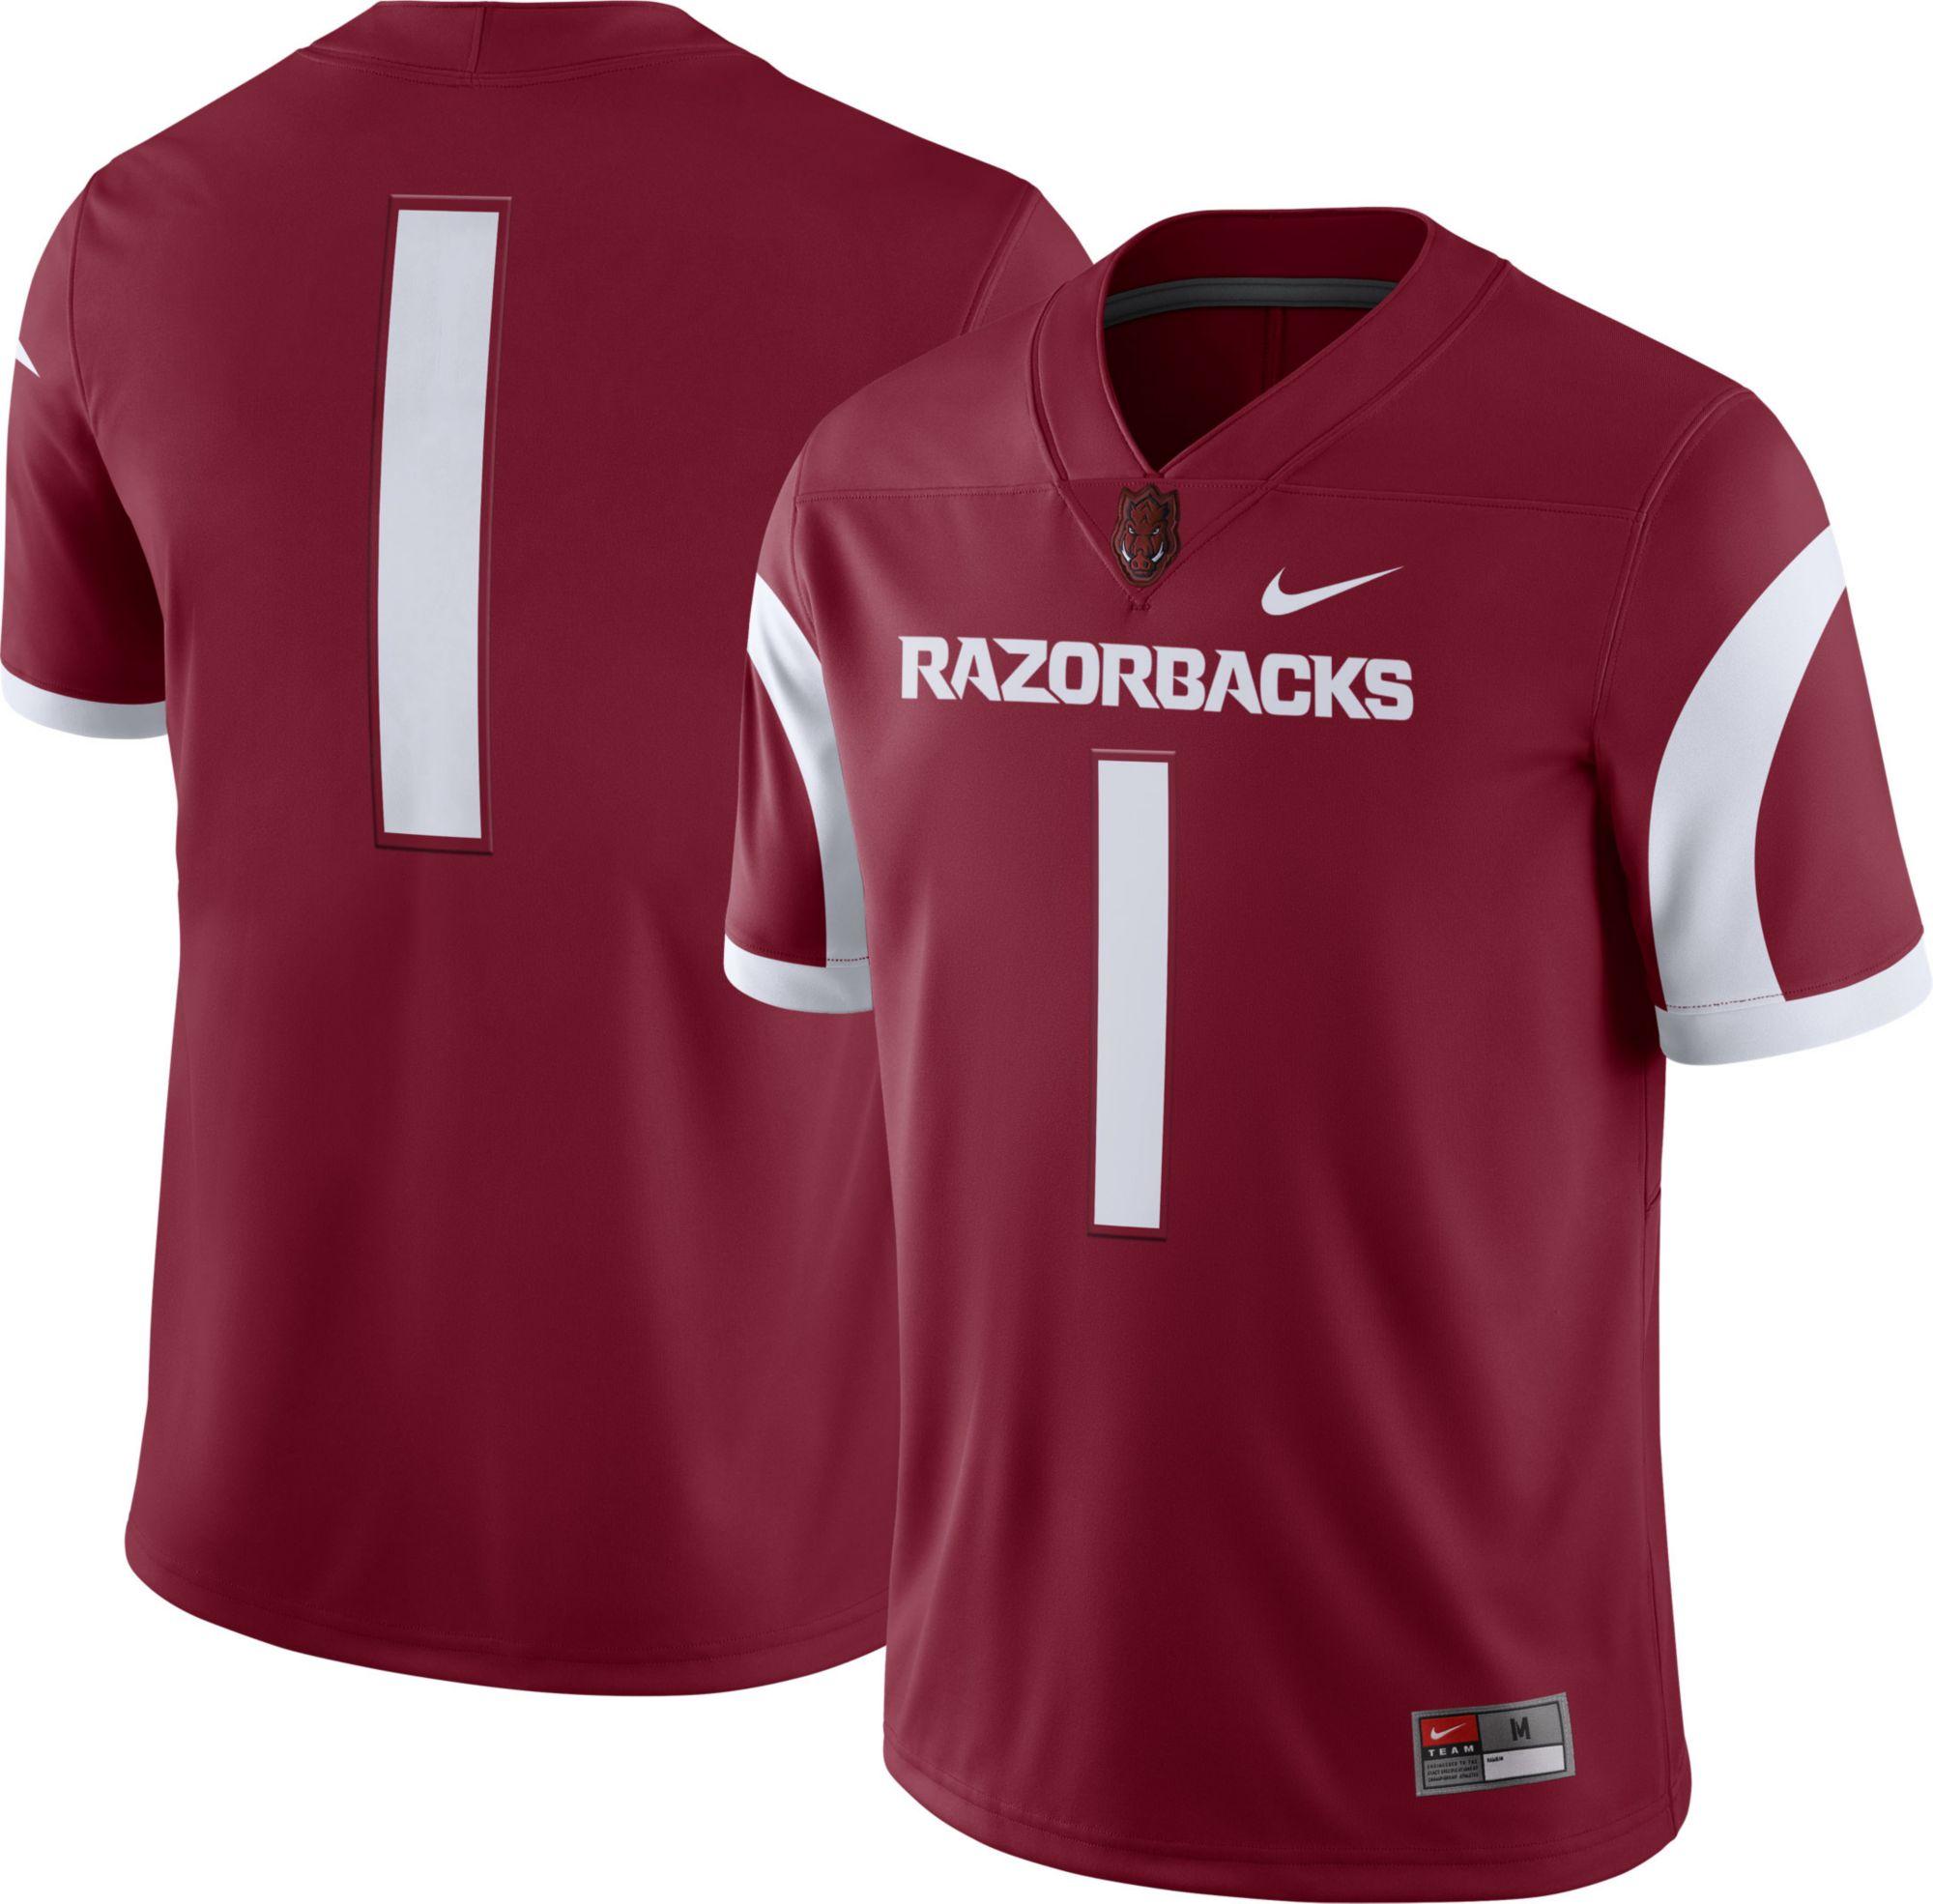 arkansas razorbacks jersey